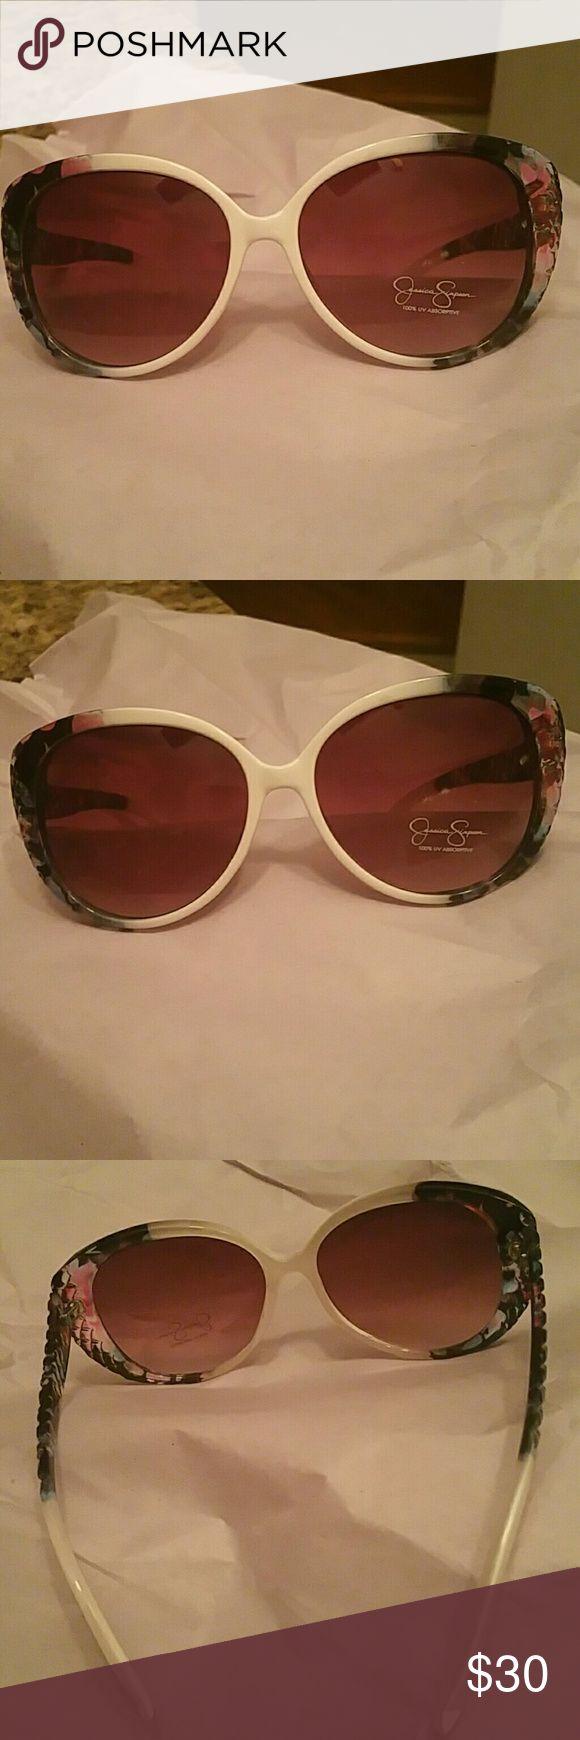 Jessica Simpson Sun glasses Jessica Simpson Sun glasses 100% uv protection Jessica Simpson Accessories Glasses